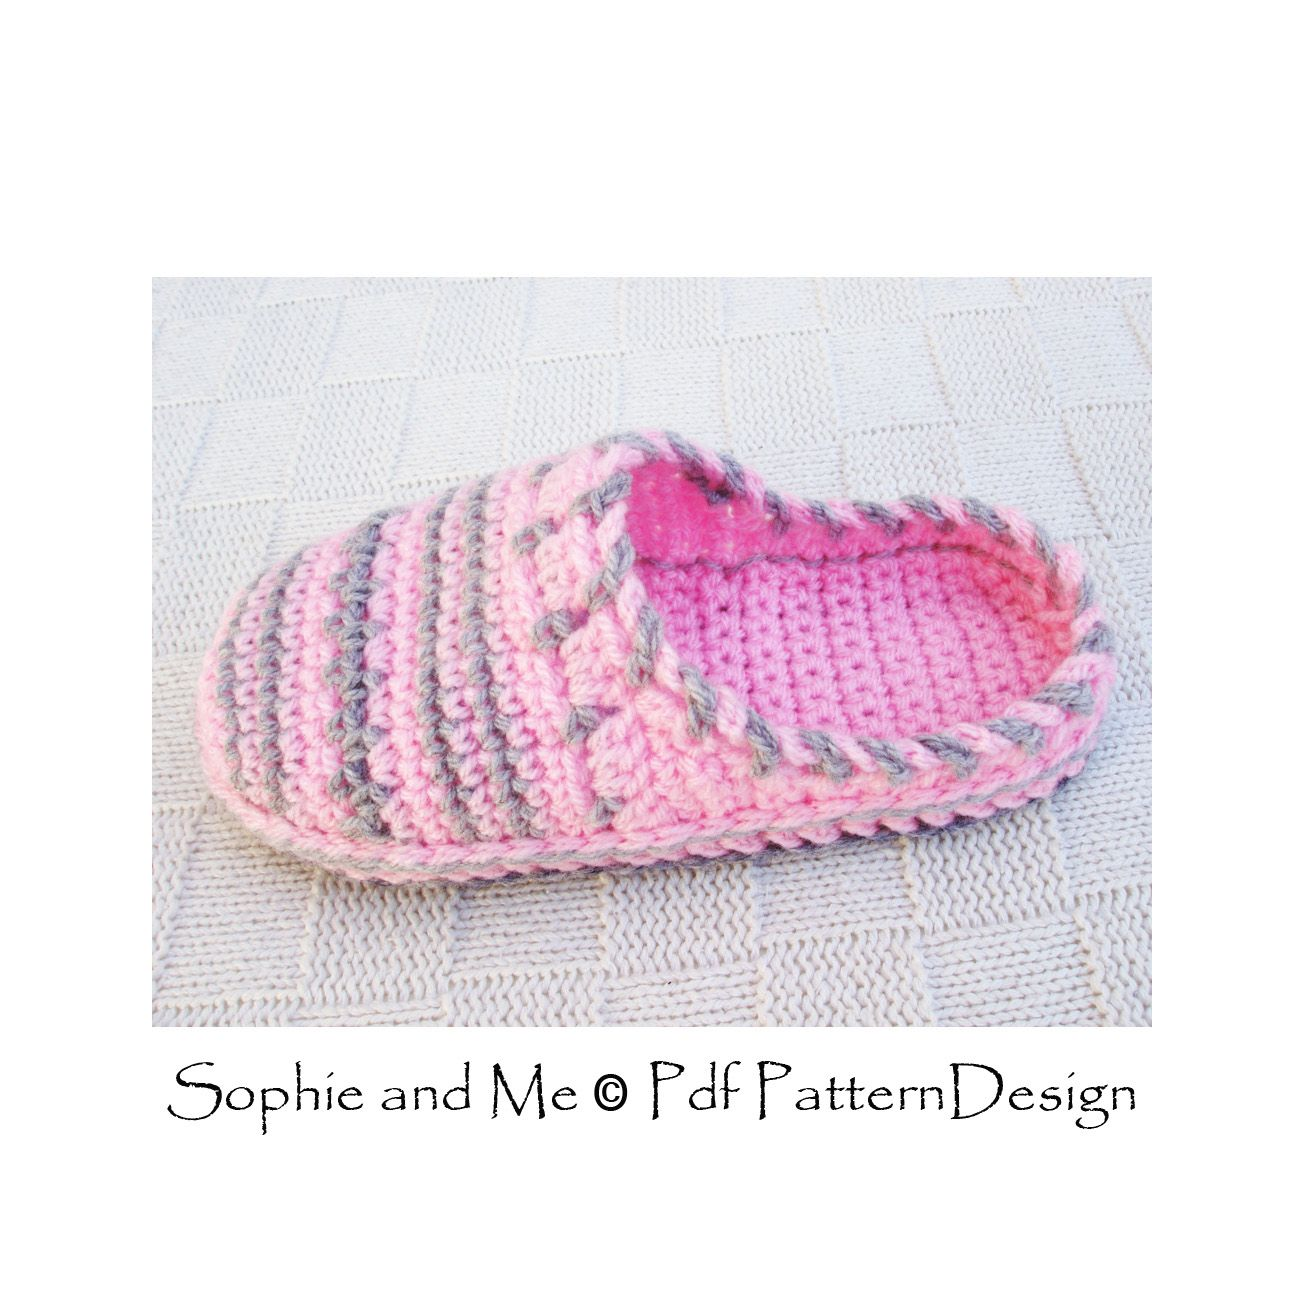 Sophie and Me   tejidos   Pinterest   Zapatos, Tejido y Crochet zapatos